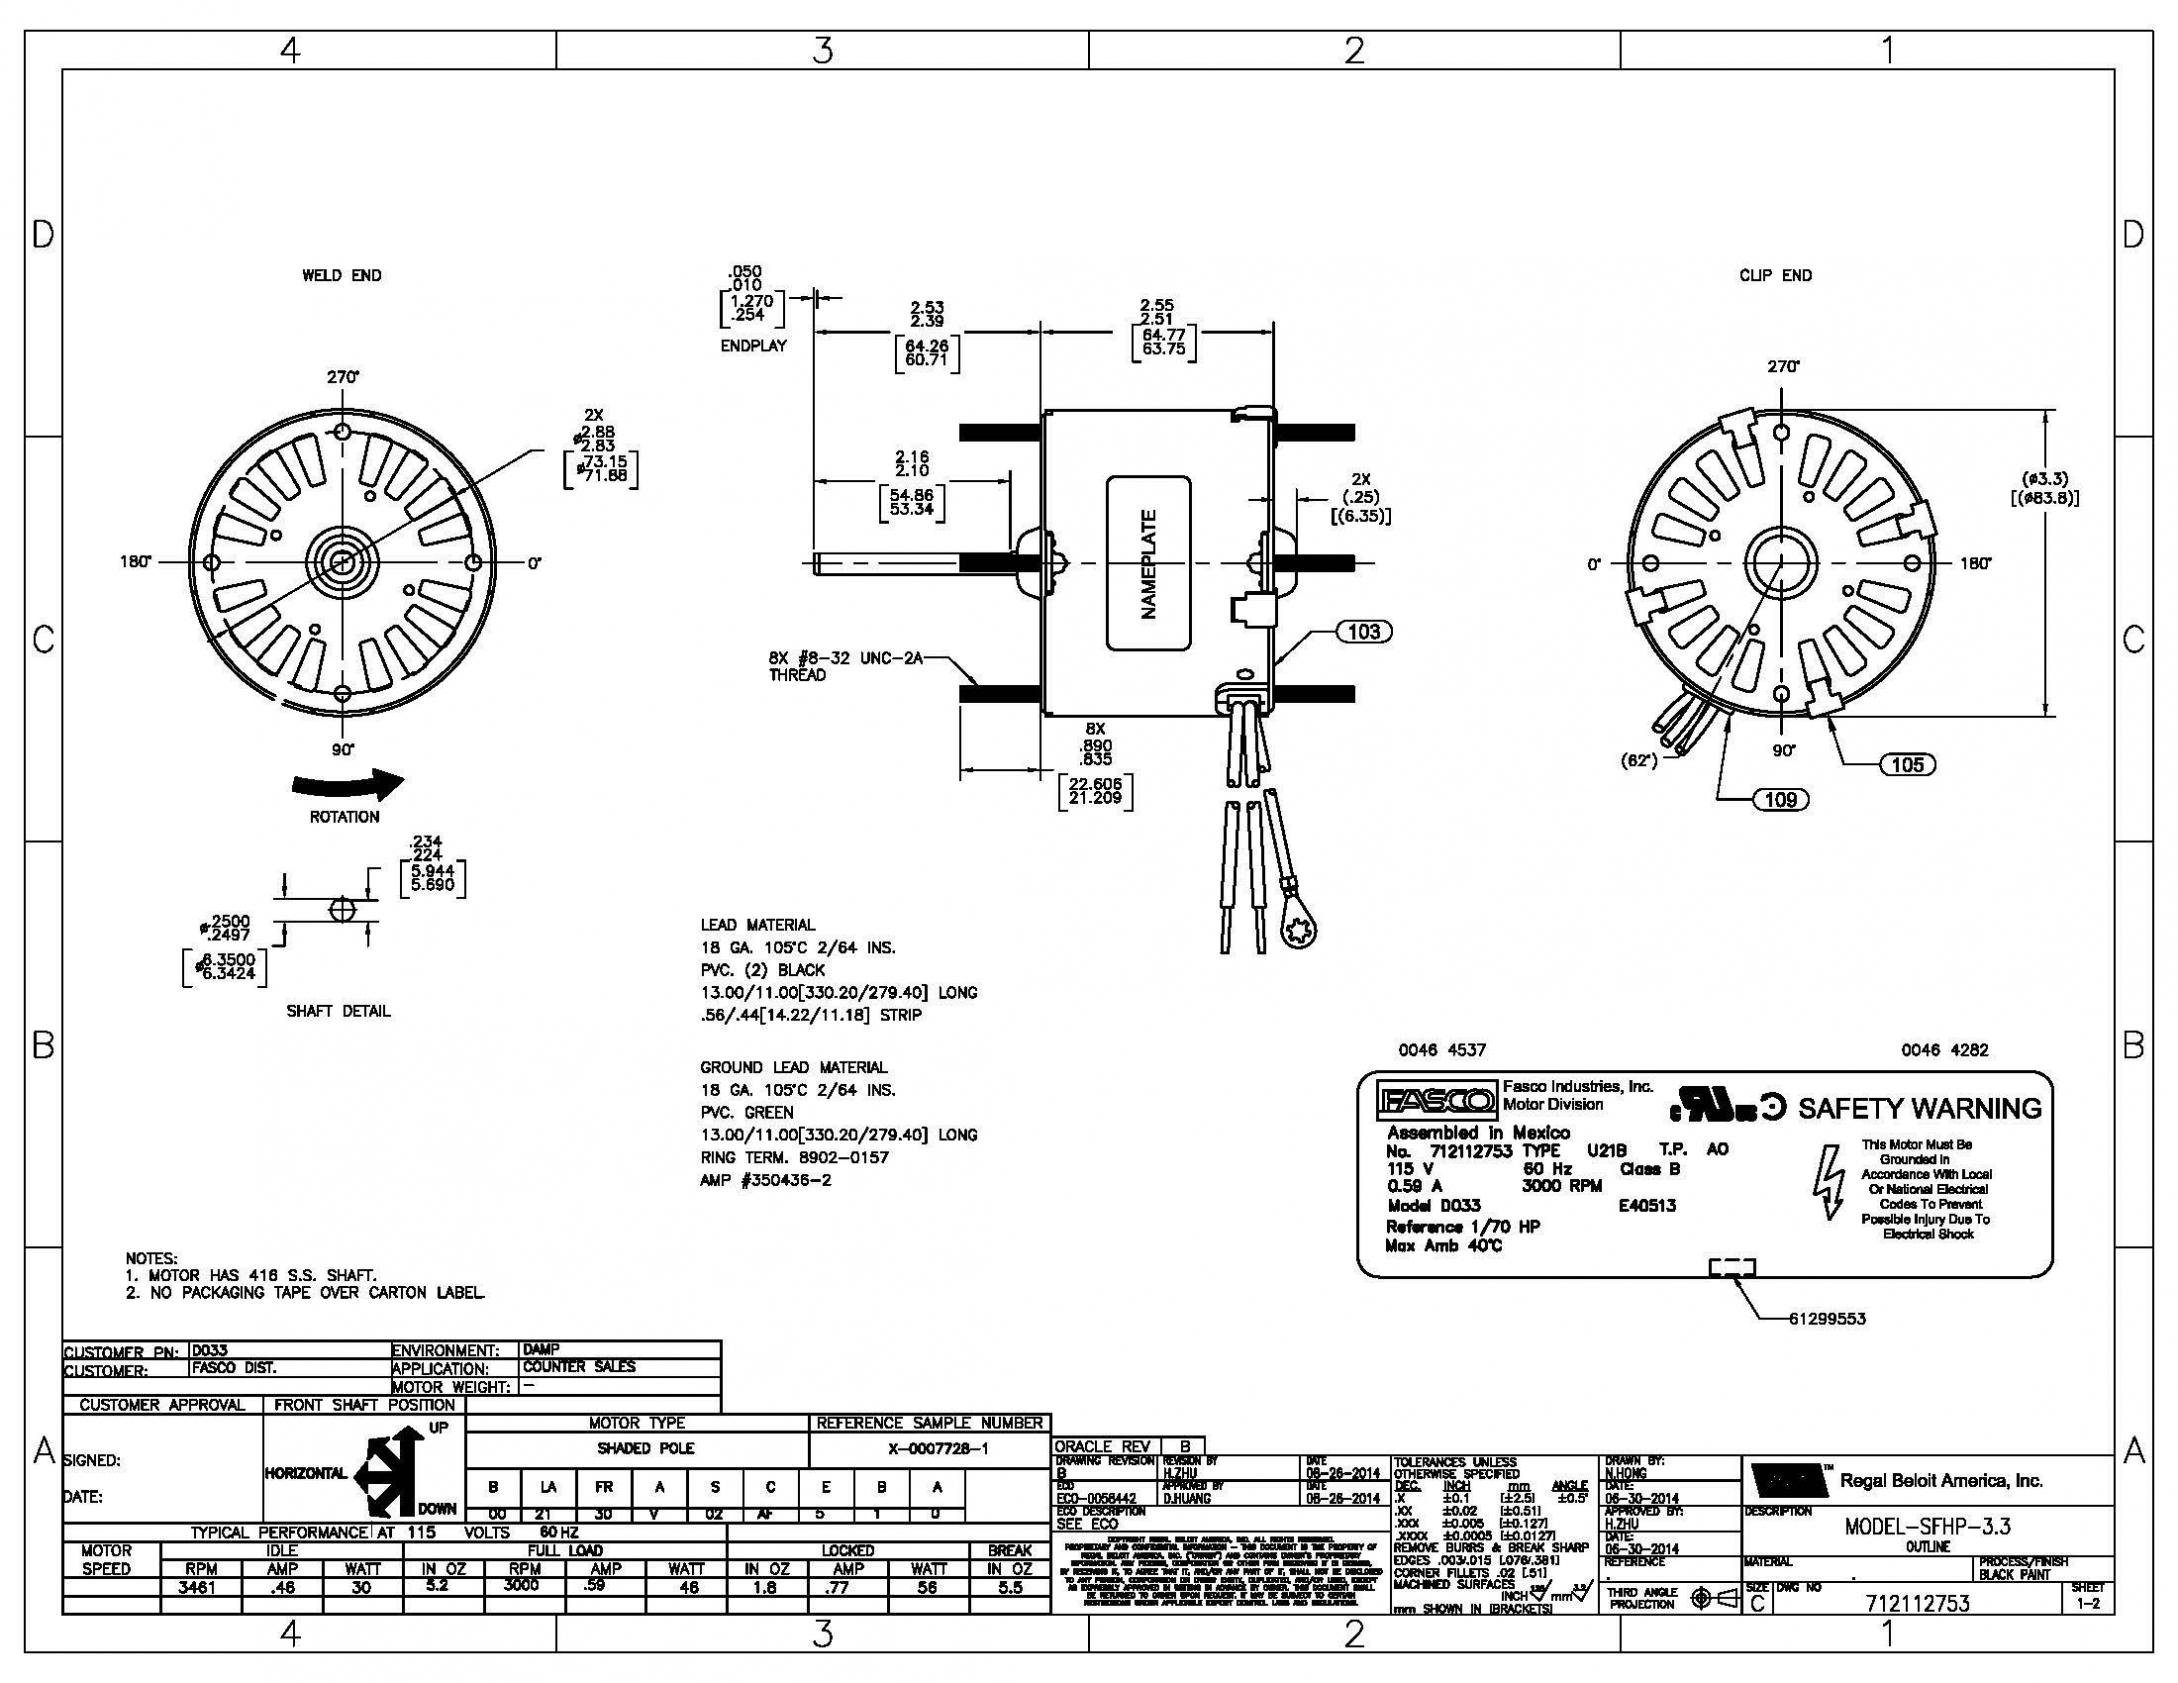 Century Electric Motor Wiring Diagram | Air American Samoa - Century Motor Wiring Diagram